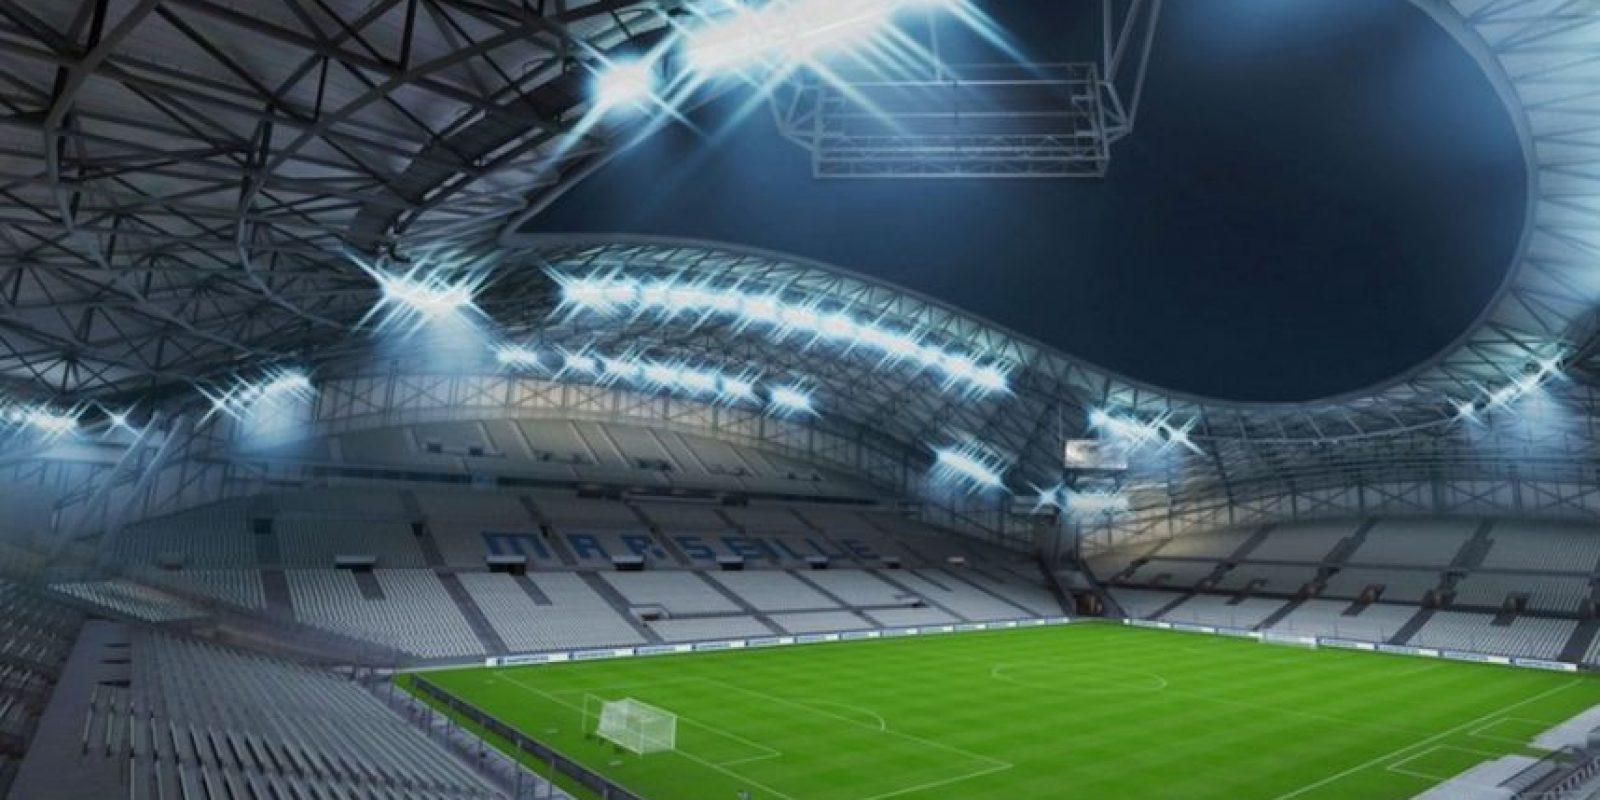 Stade Vélodrome (Olympique de Marsella, Ligue 1) Foto:EA Sports